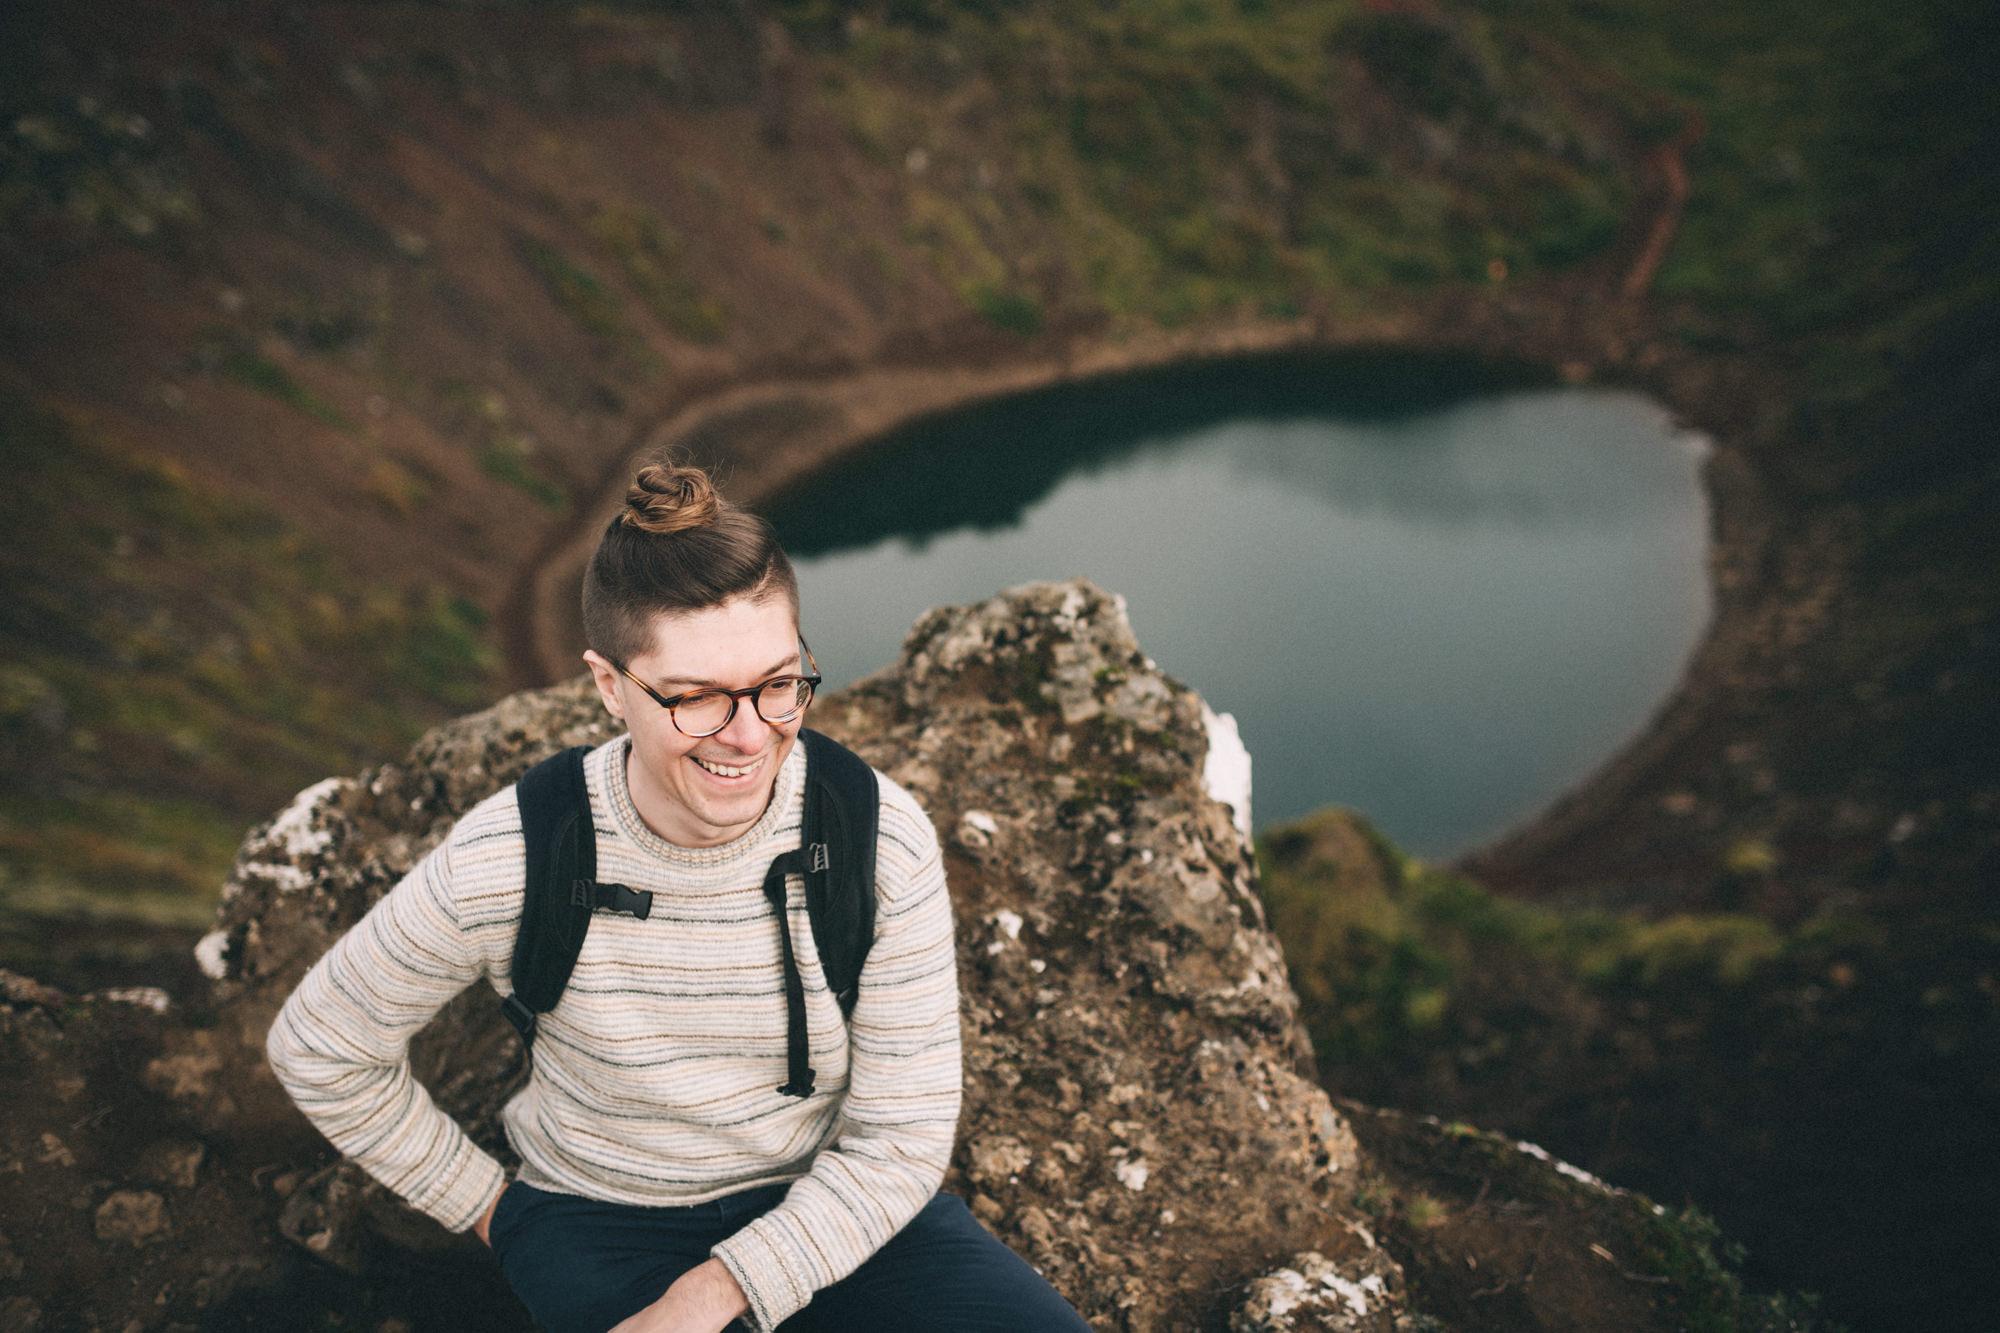 Sarah-Katherine-Davis-Photography-Iceland-Adventure-Elopement-Photographer-Louisville-Kentucky-Wedding-Photographer-Travel-Vik-Beach-Engagement-Session-Cozy-Iceland-South-Coast-101edit.jpg